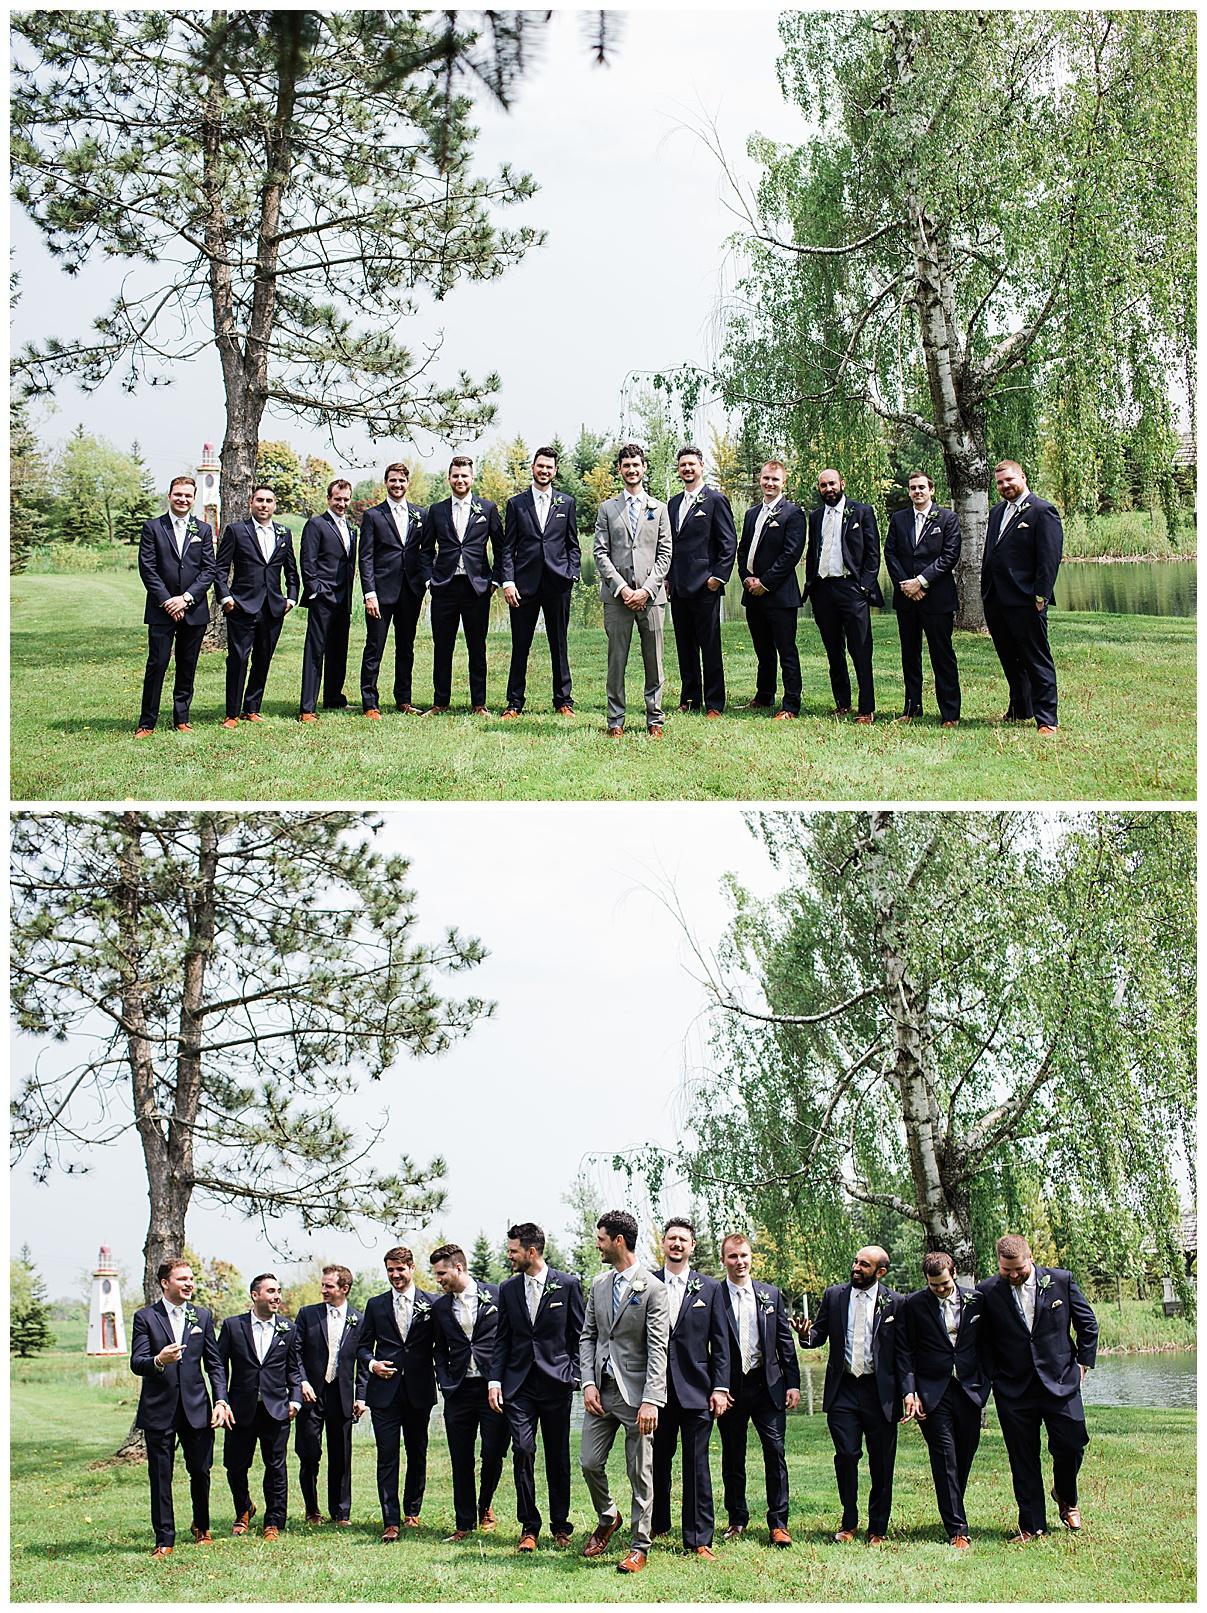 Groom and groomsmen standing outside under trees| Belcroft Estate Wedding| Toronto wedding photographer| Ontario wedding photographer| 3photography